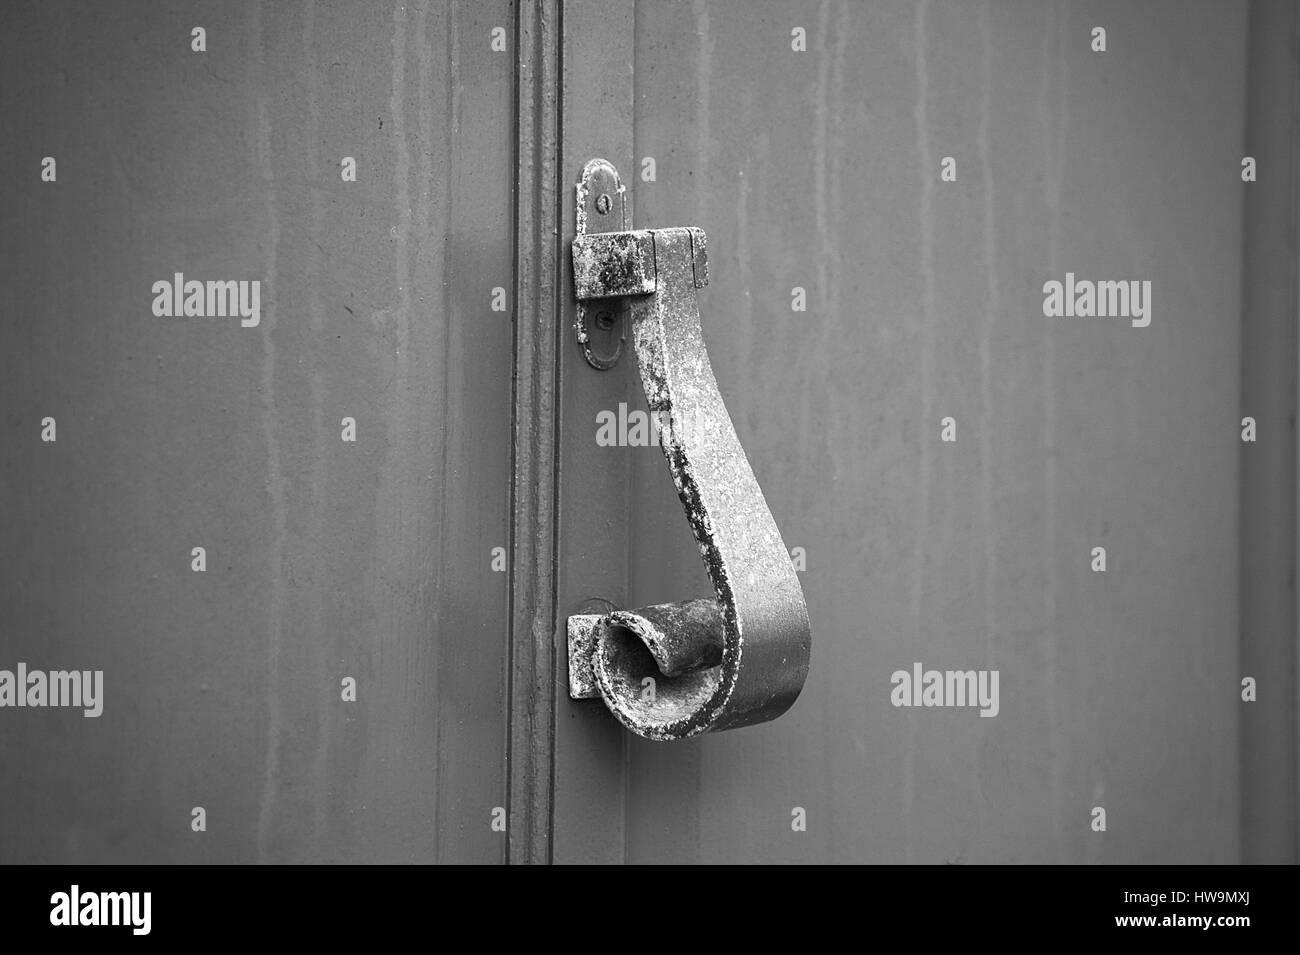 heurtoir de porte . - Stock Image